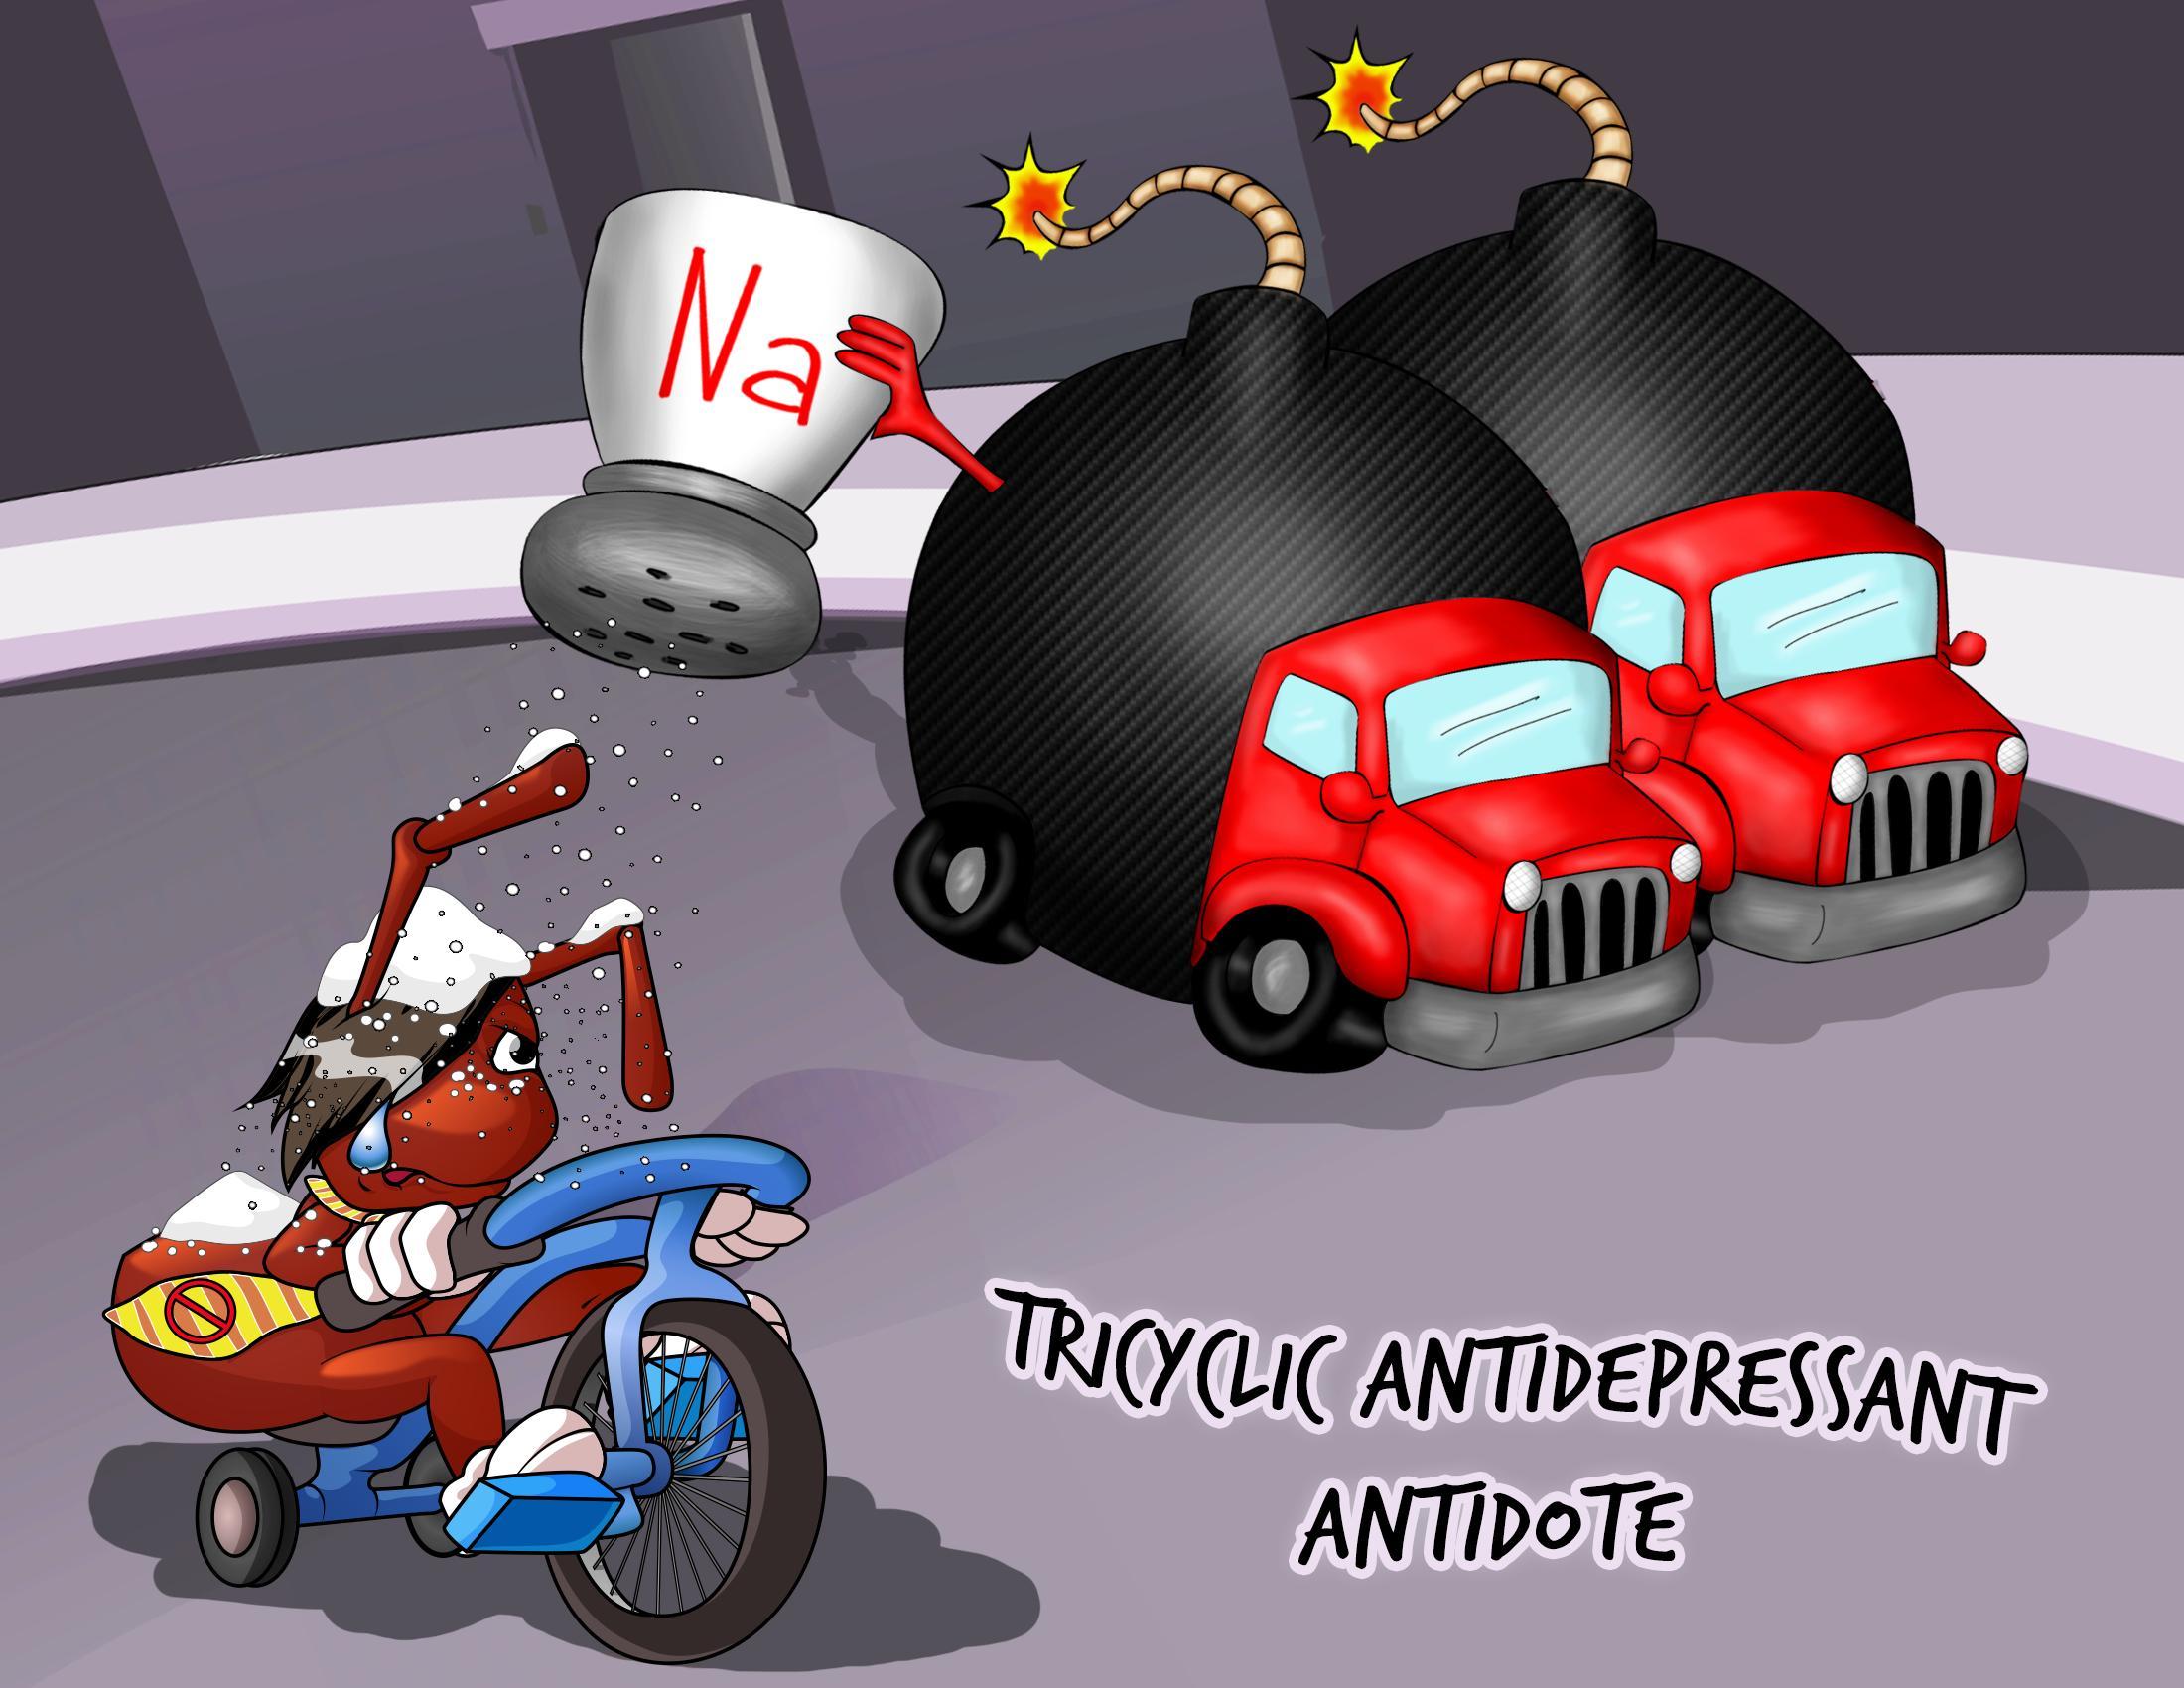 Tricyclic Antidepressant (TCA) Antidote